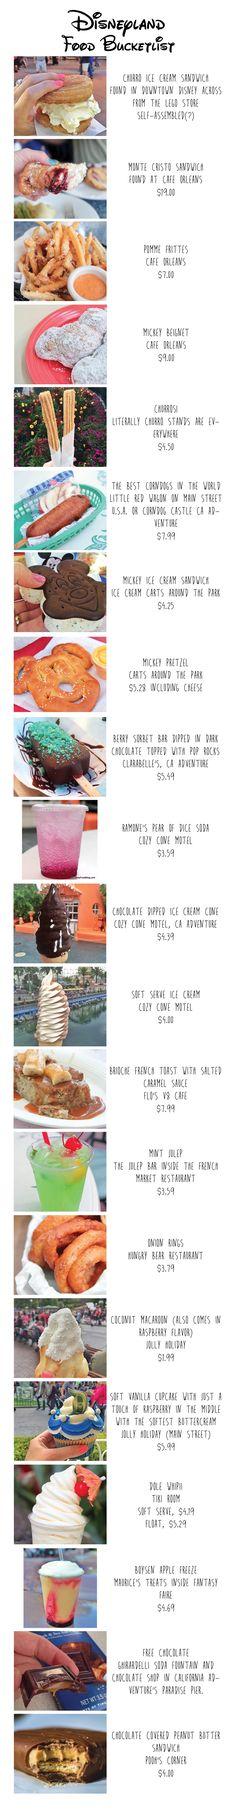 Disneyland Food Bucketlist